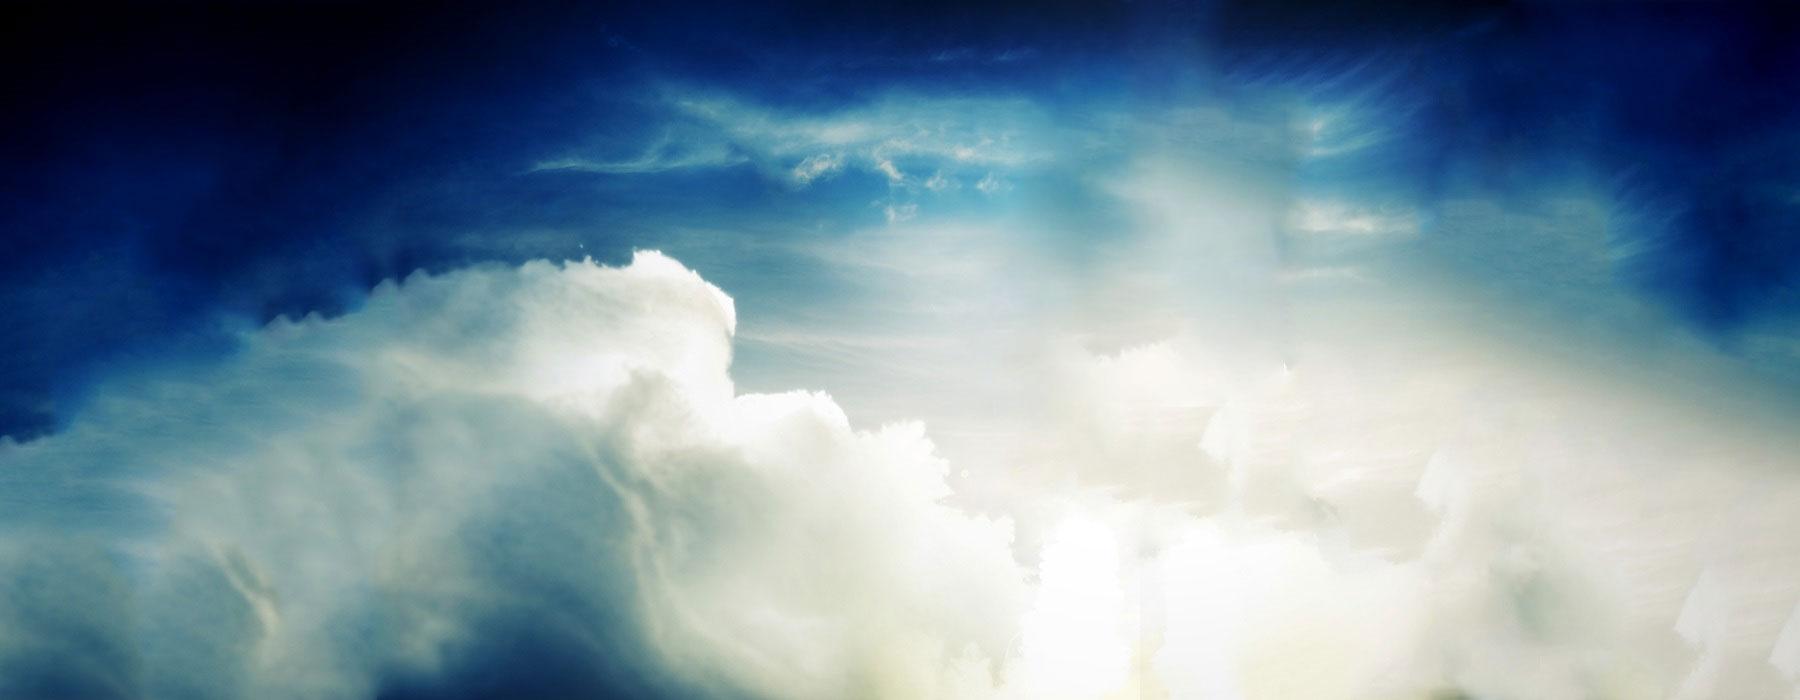 Sesam sky